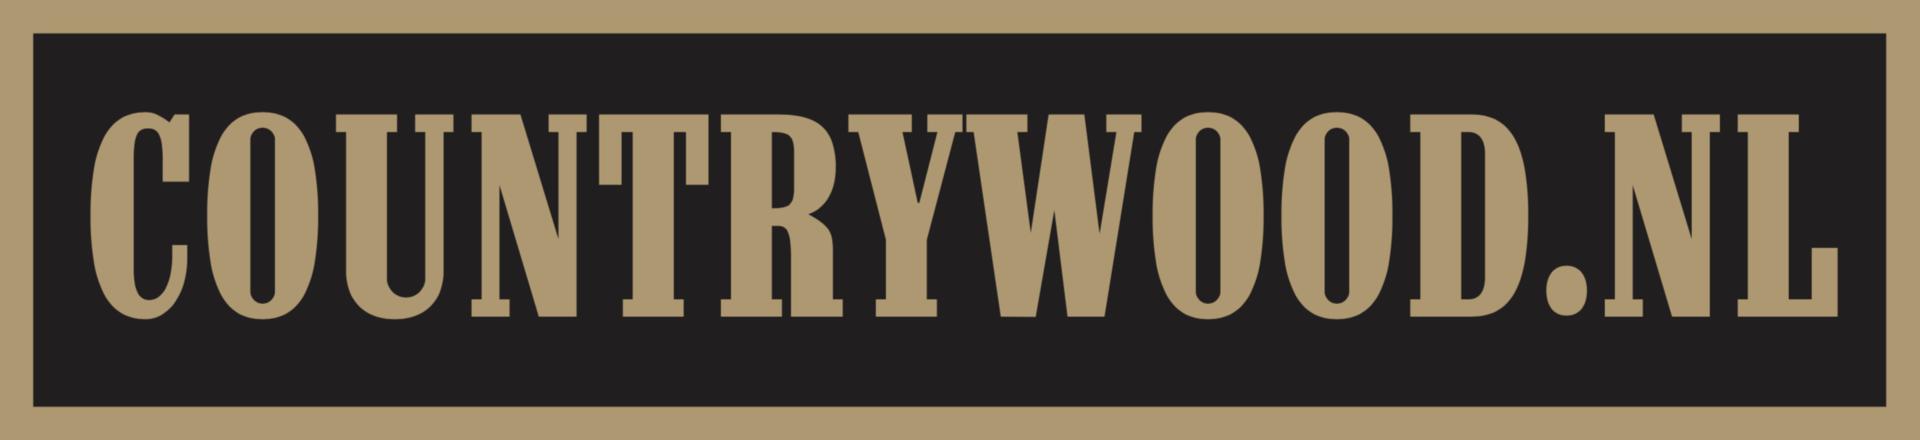 logo Countrywood